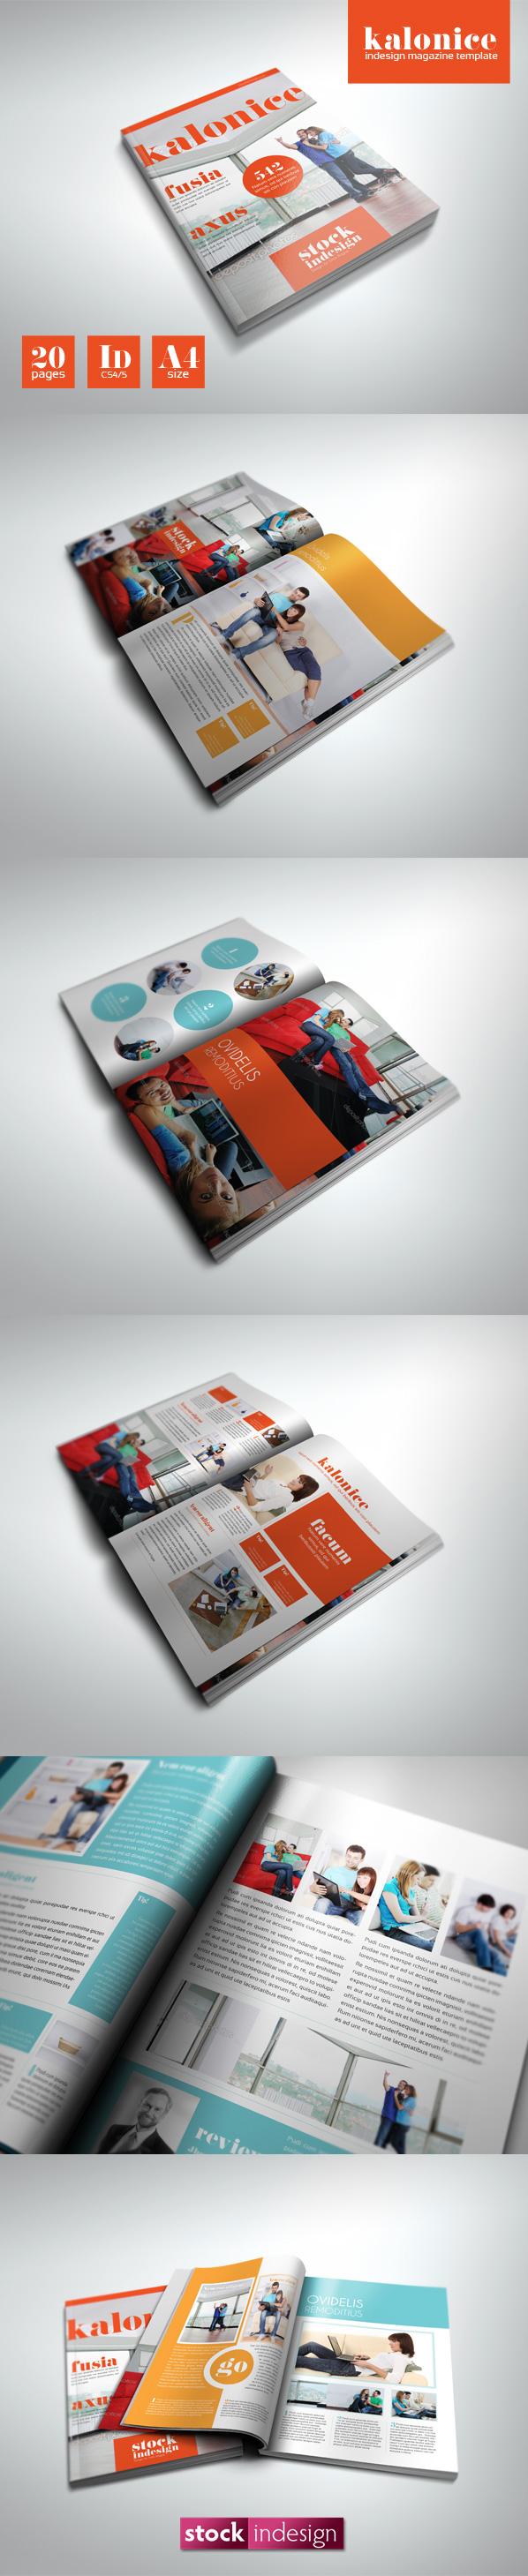 InDesign PRO Magazine Template: Kalonice   Indesign   Pinterest